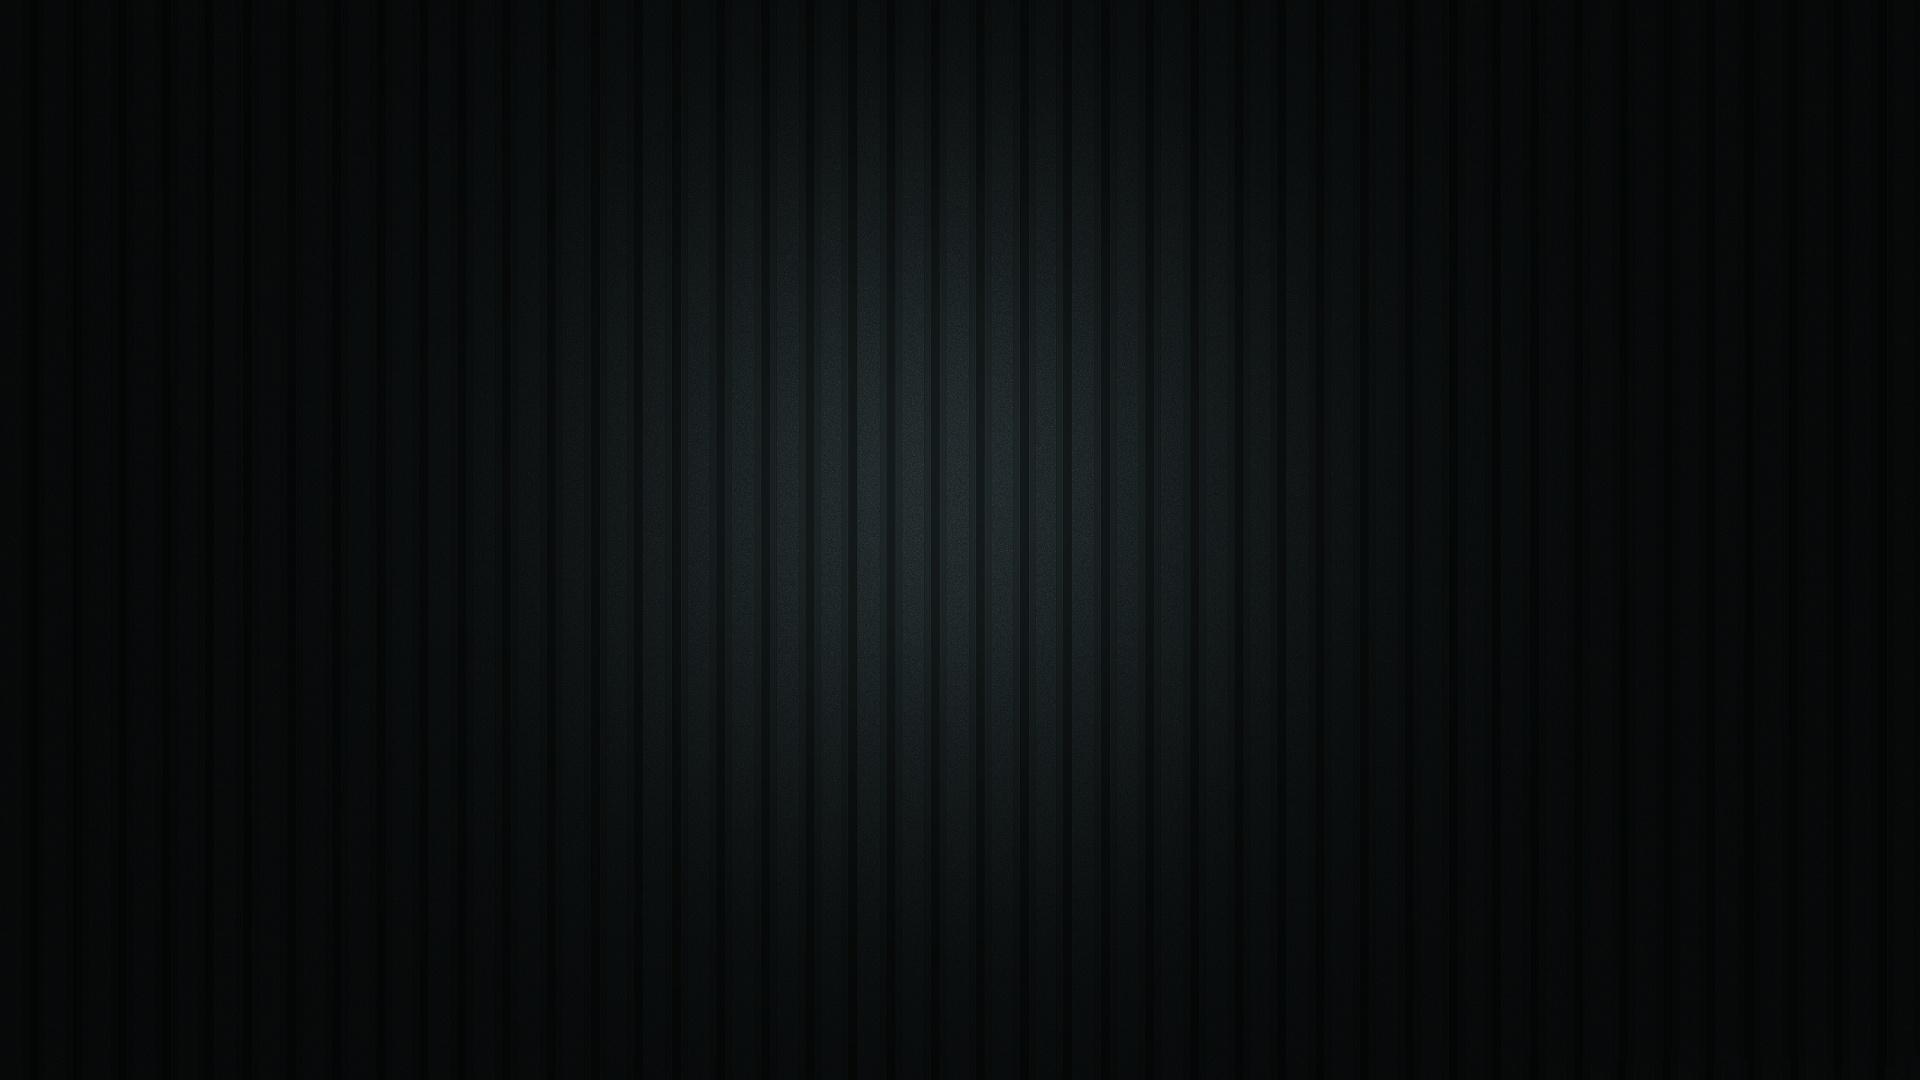 Minimalist Wallpaper Fall Download Black Elegant Backgrounds Free Pixelstalk Net